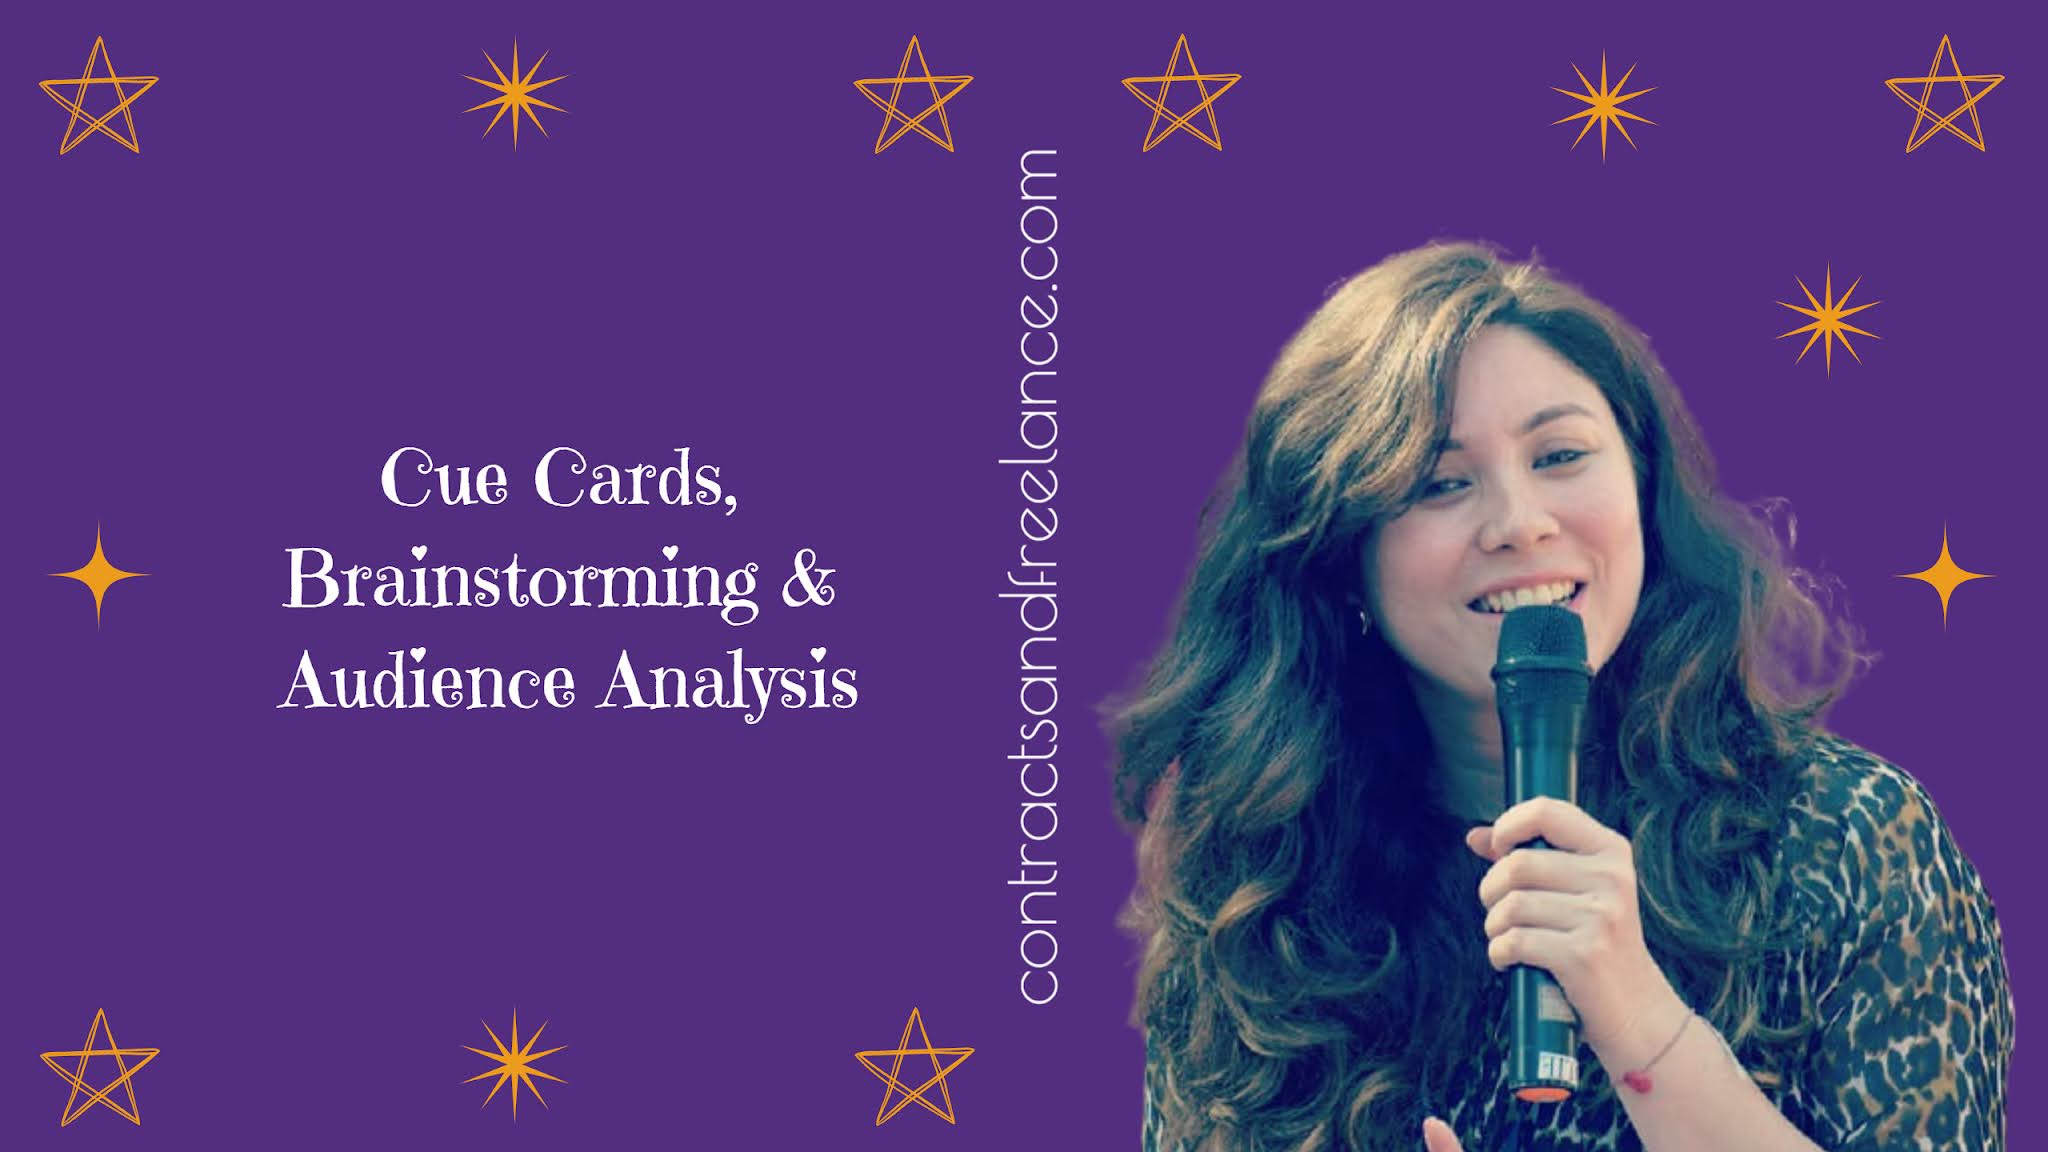 Public Speaking Tips: Cue Cards, Brainstorming, Audience Analysis   Nancy Shah